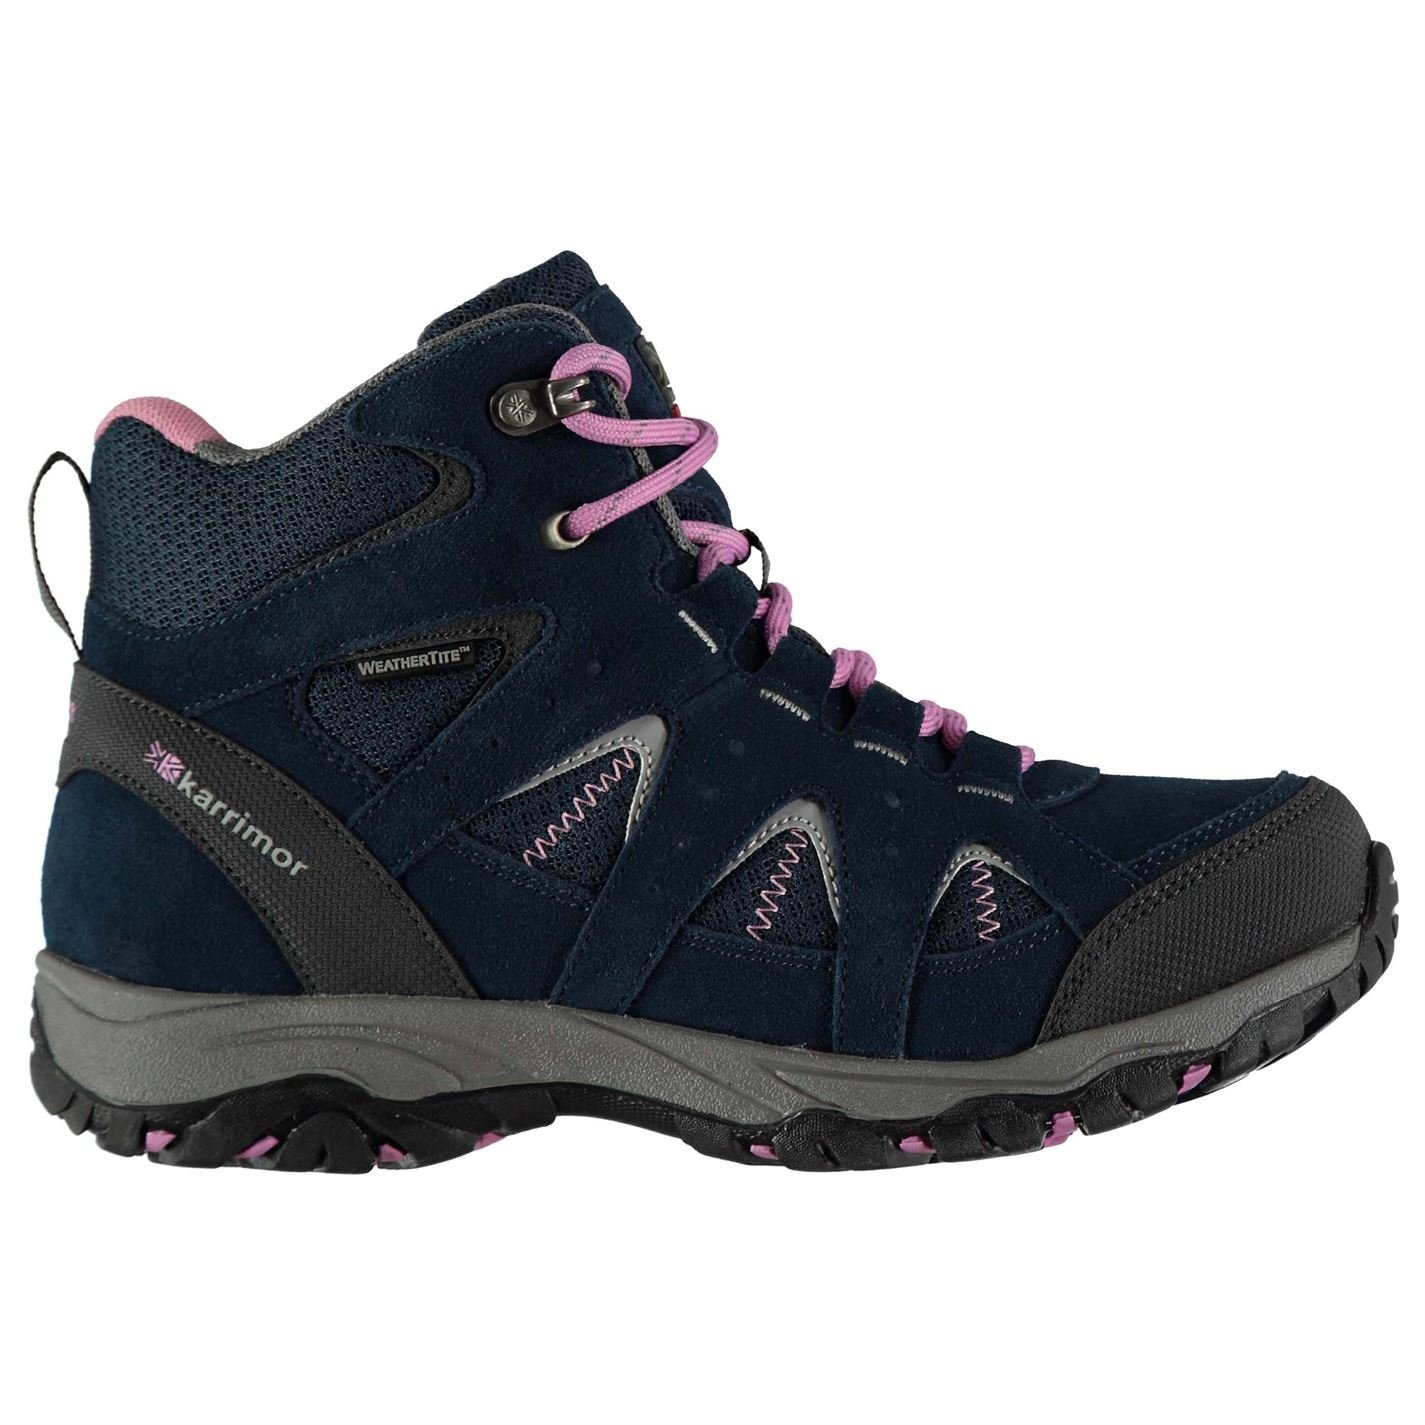 cd9b51f42c7 Karrimor Kids Mount Mid Walking Boots